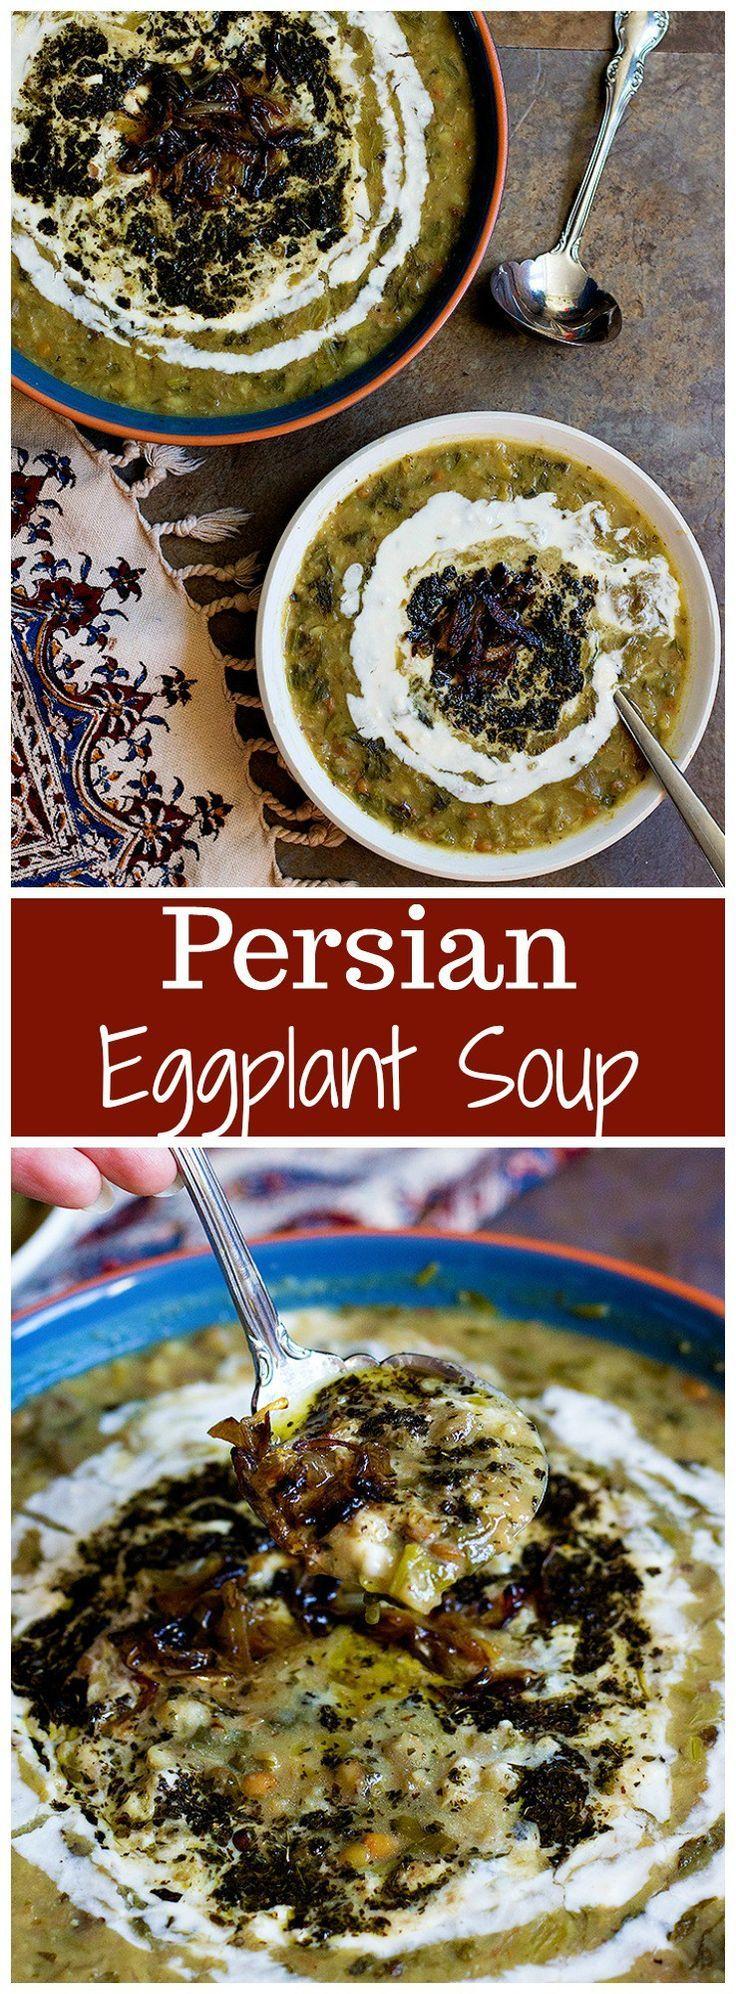 Eggplant Soup | Ash-e Bademjan | Persian Recipes |  Persian Soup |  Persian Food | Winter Soup